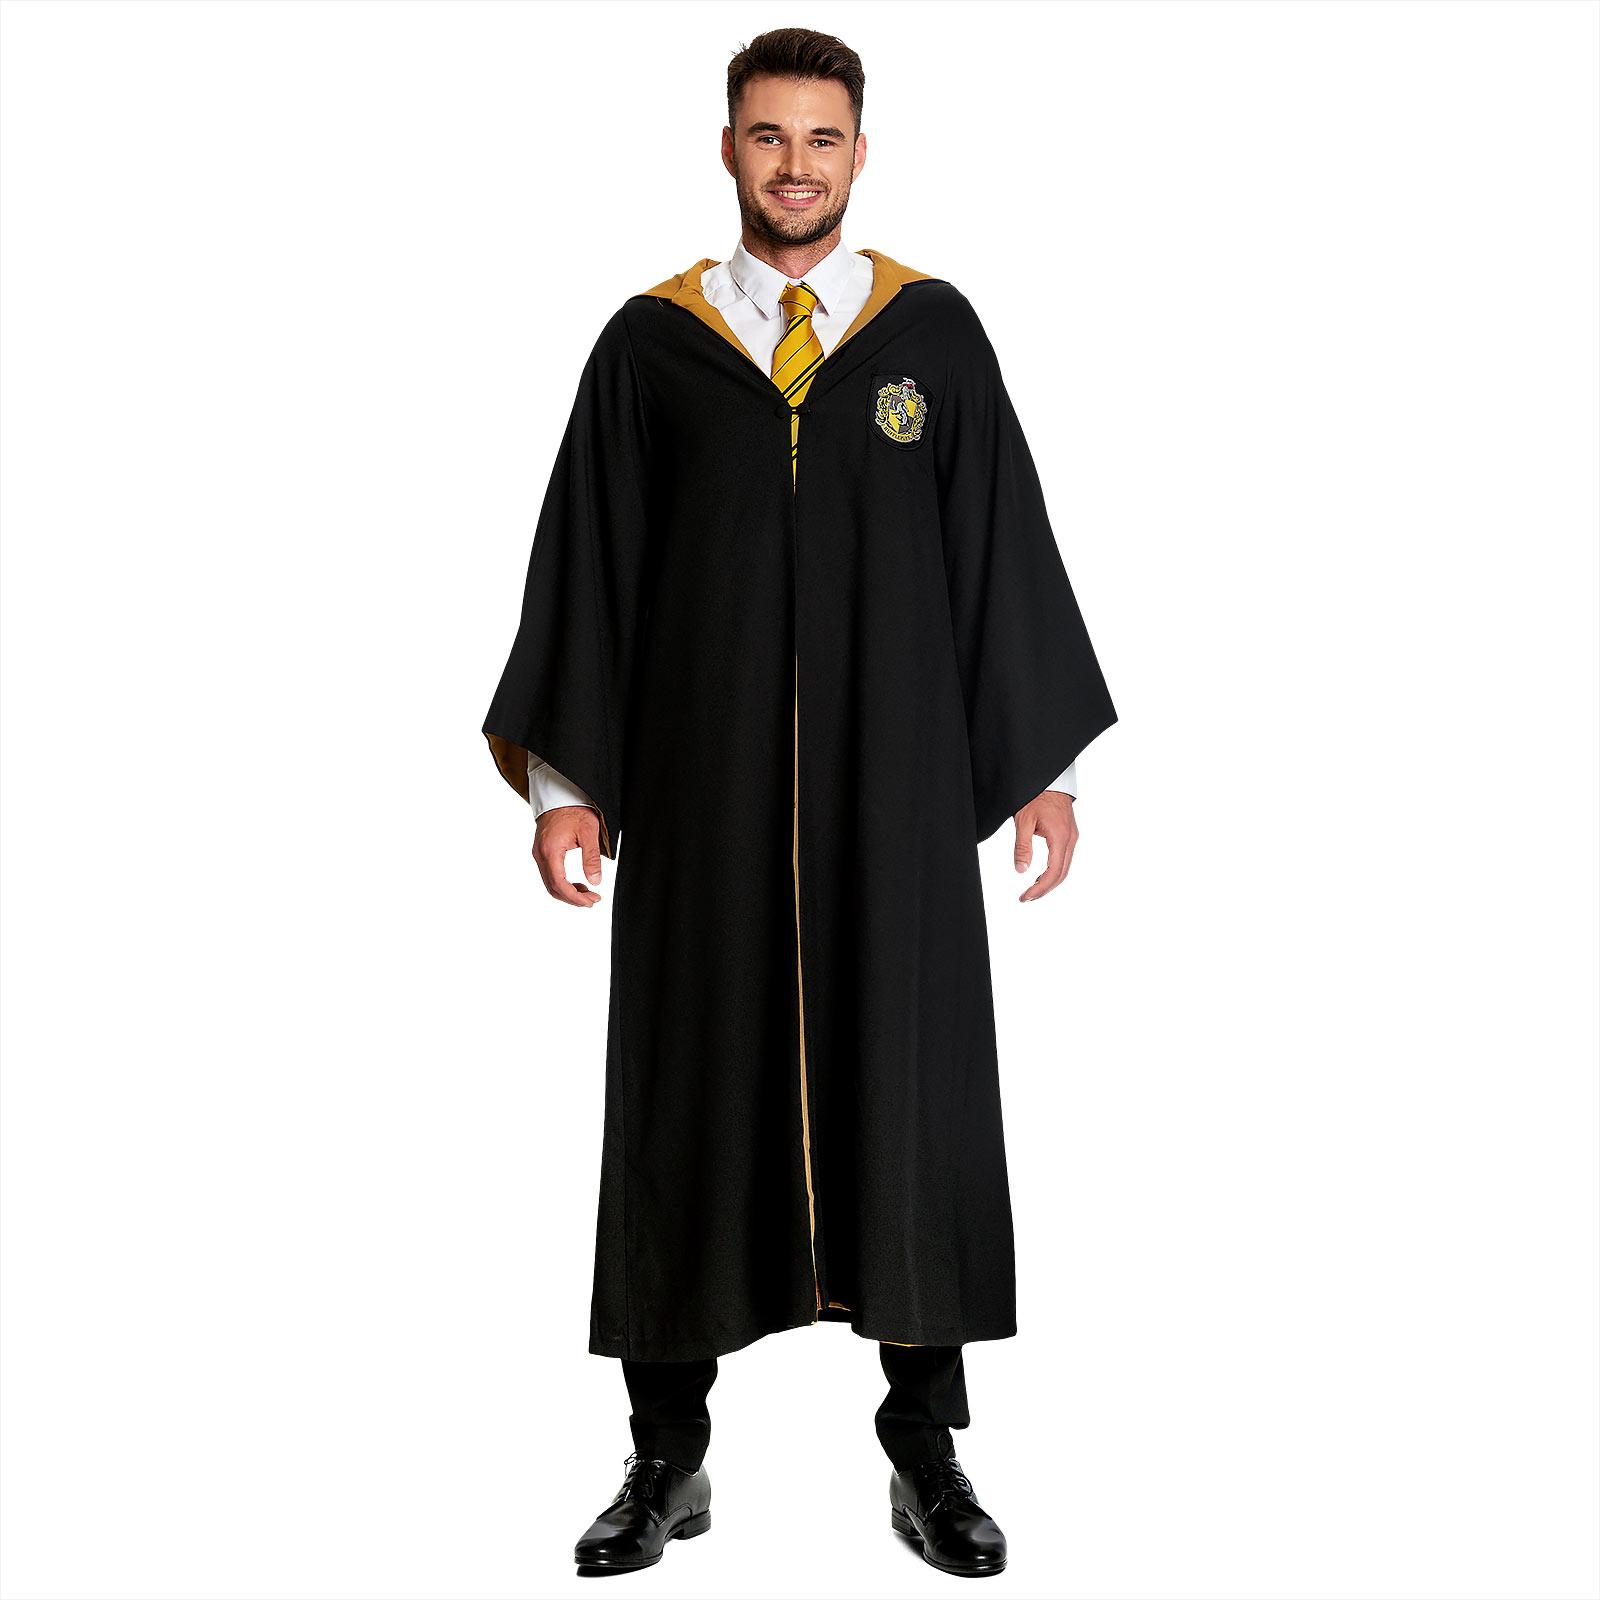 Harry Potter - Hufflepuff Zauberergewand